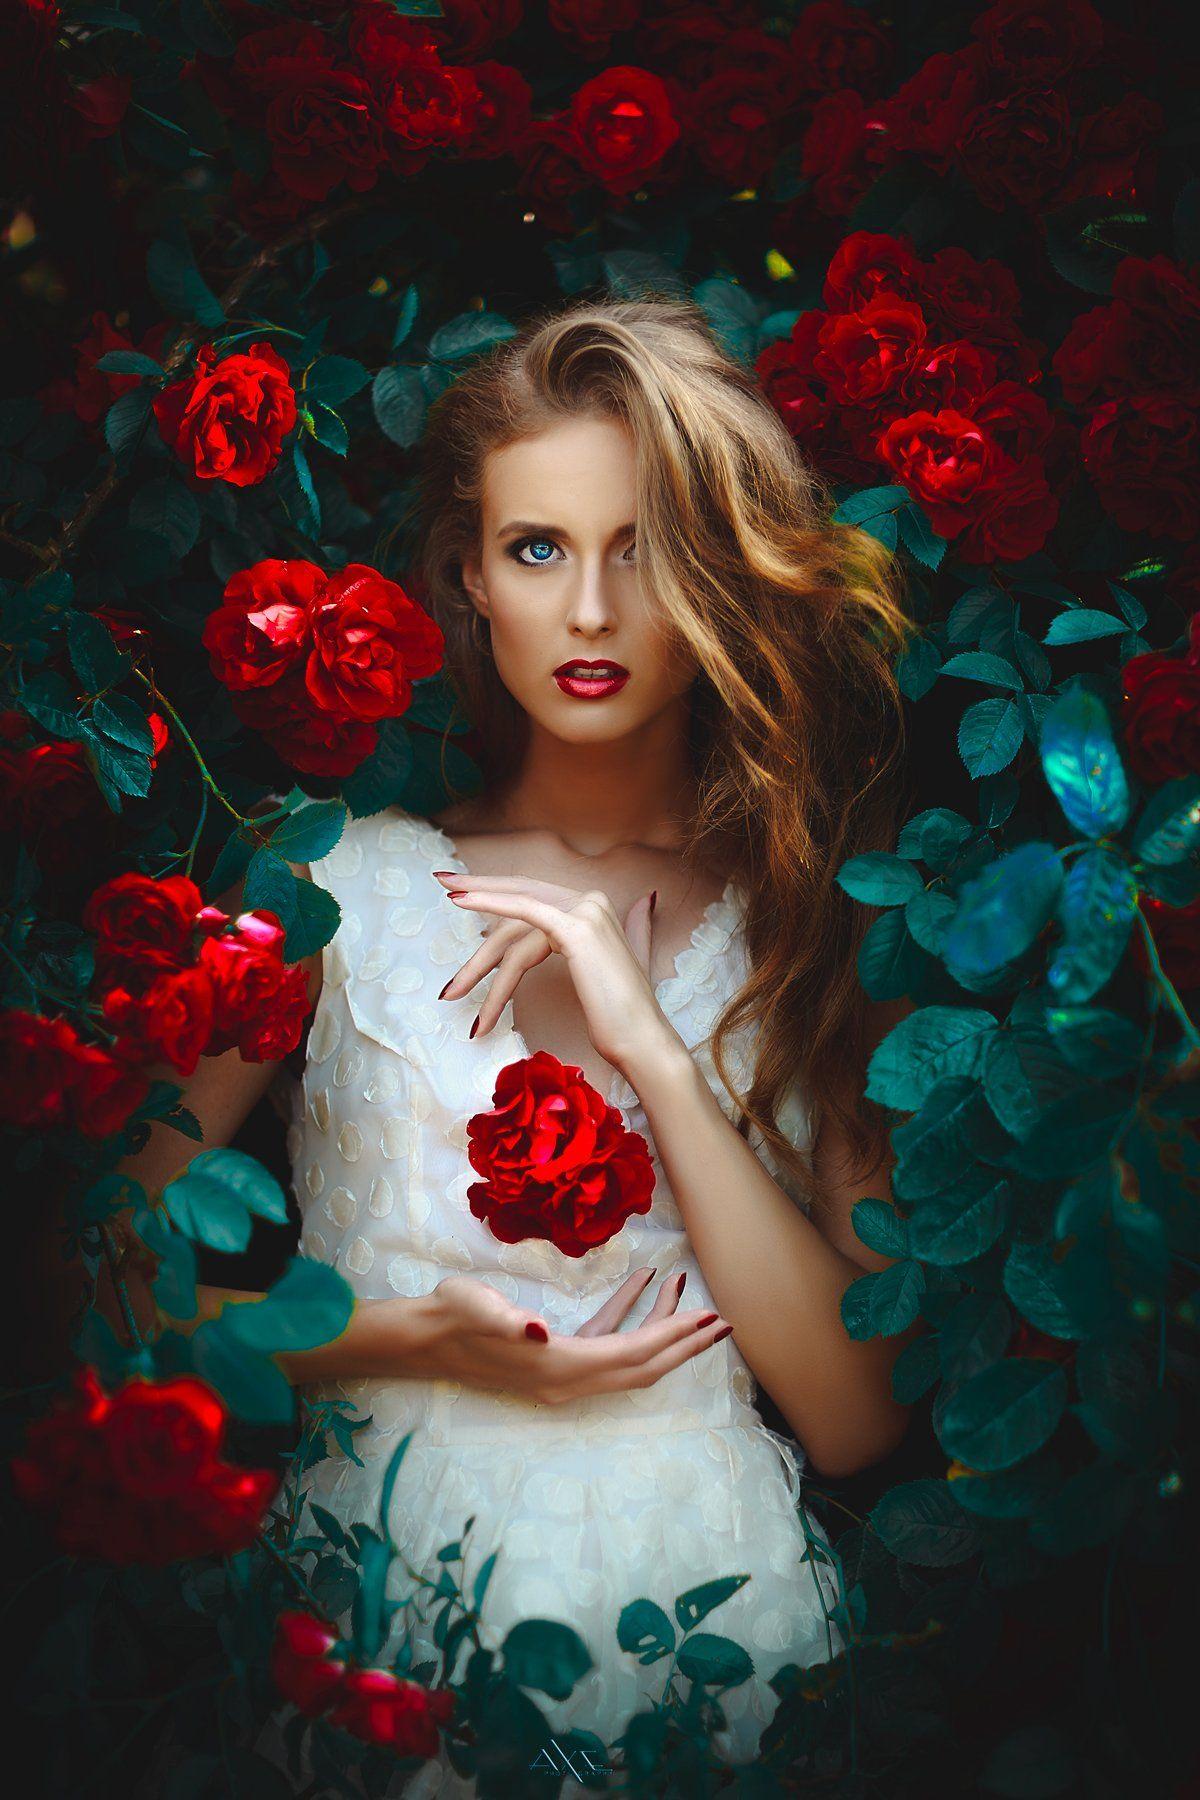 Portrait, Roses, Toning, Woman, Руслан Болгов (Axe)